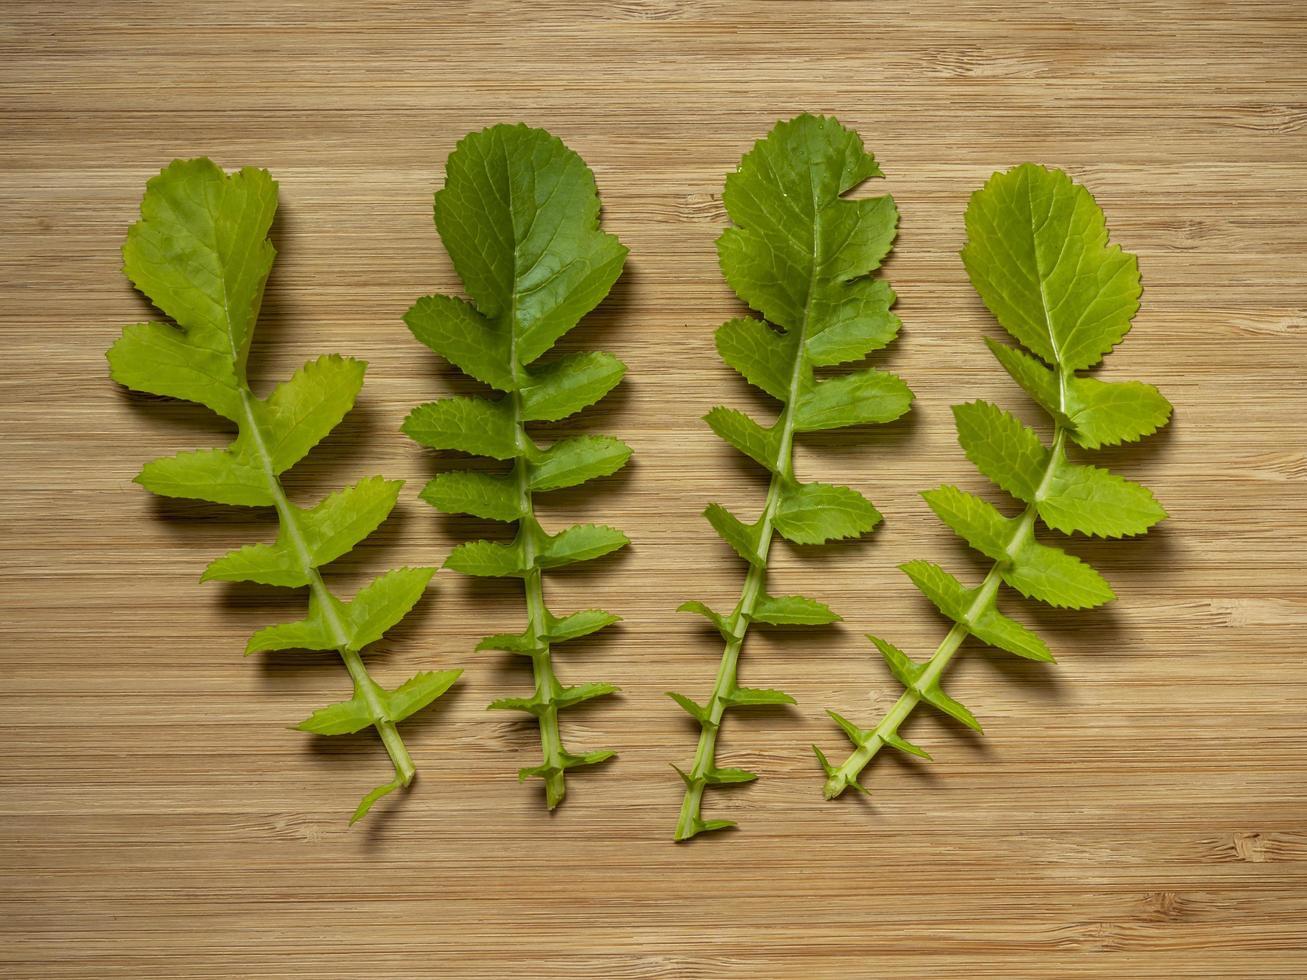 Leaves of leaf radish Saisai on a wooden board photo